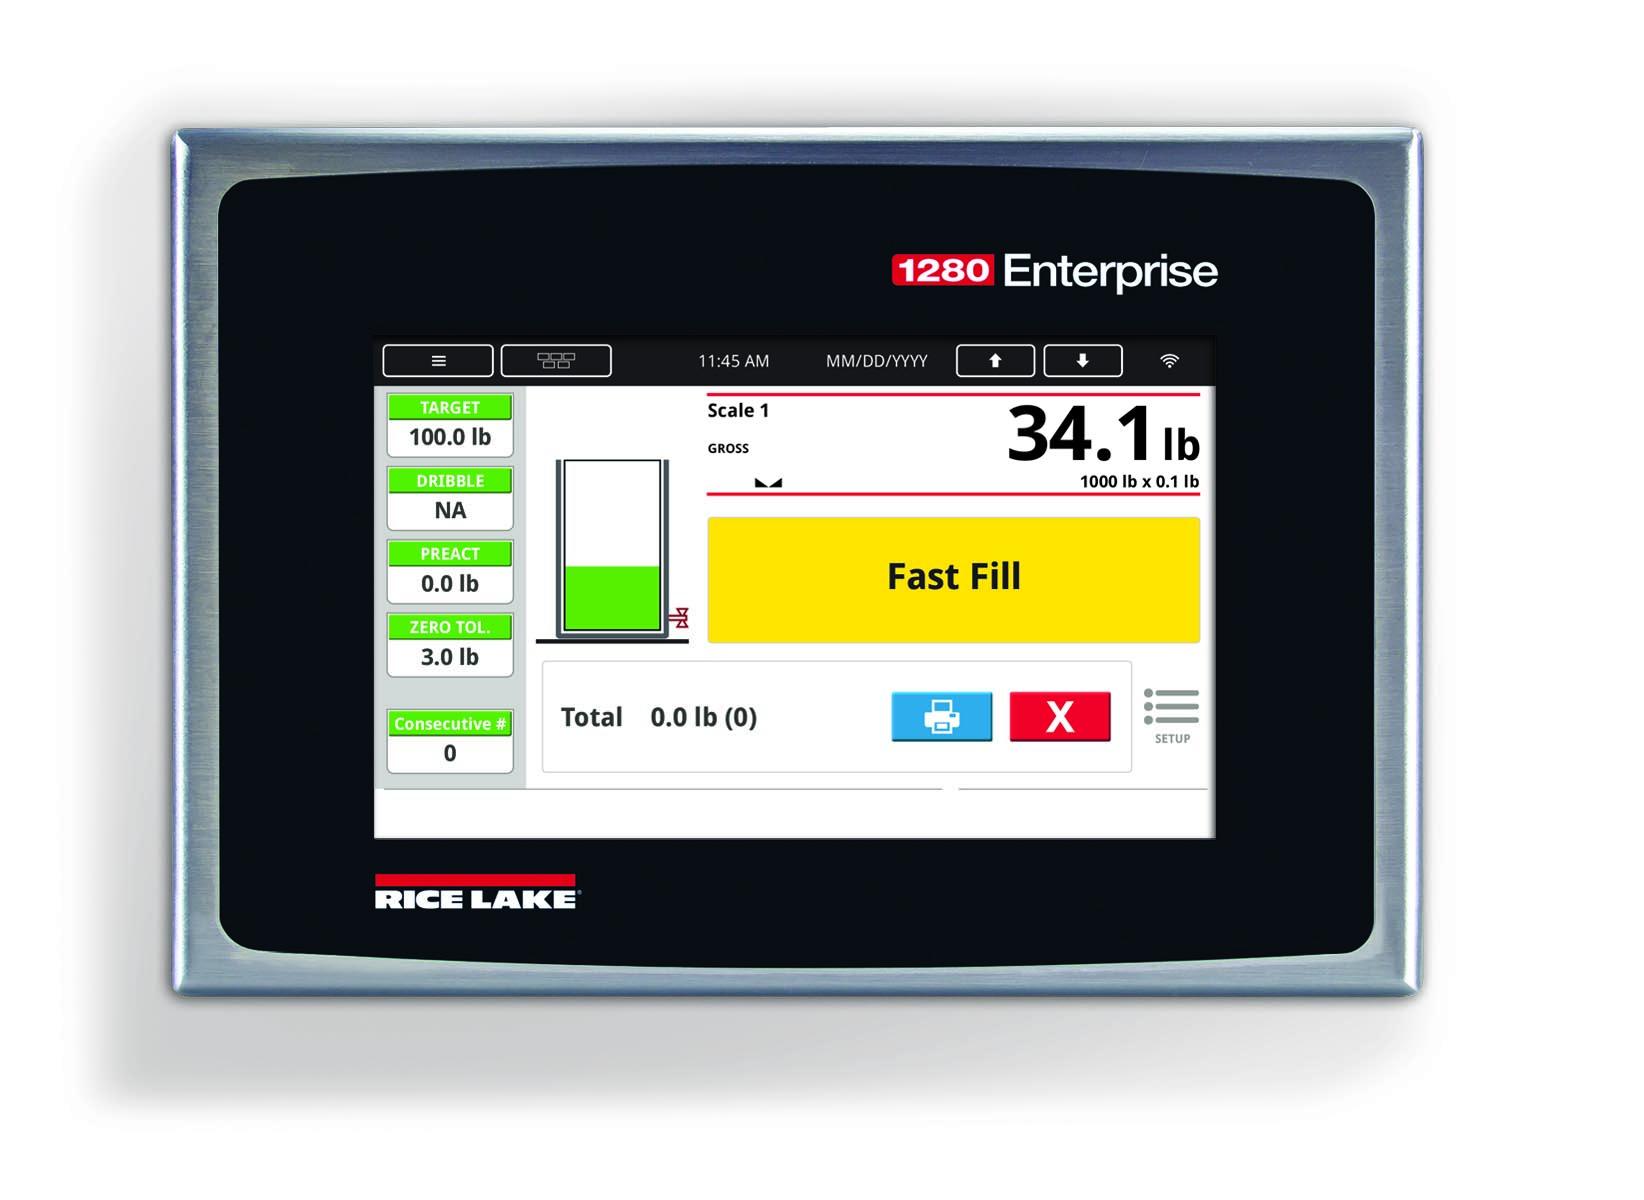 1280 Enterprise Programmable Terminal large image